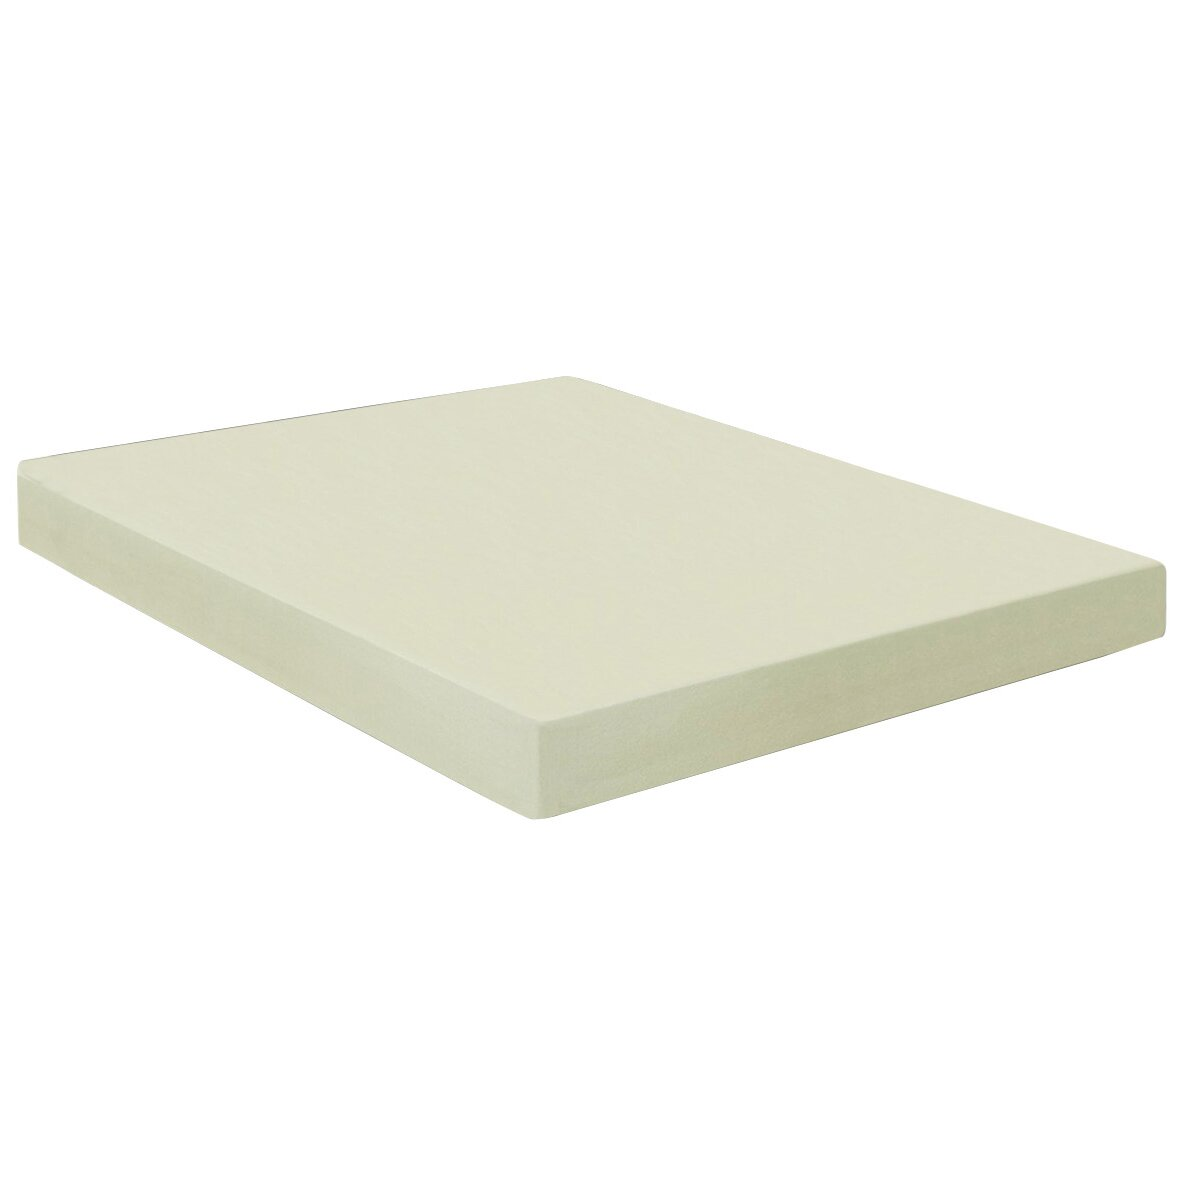 Best Price Quality Best Price Quality 6 Memory Foam Mattress Reviews Wayfair